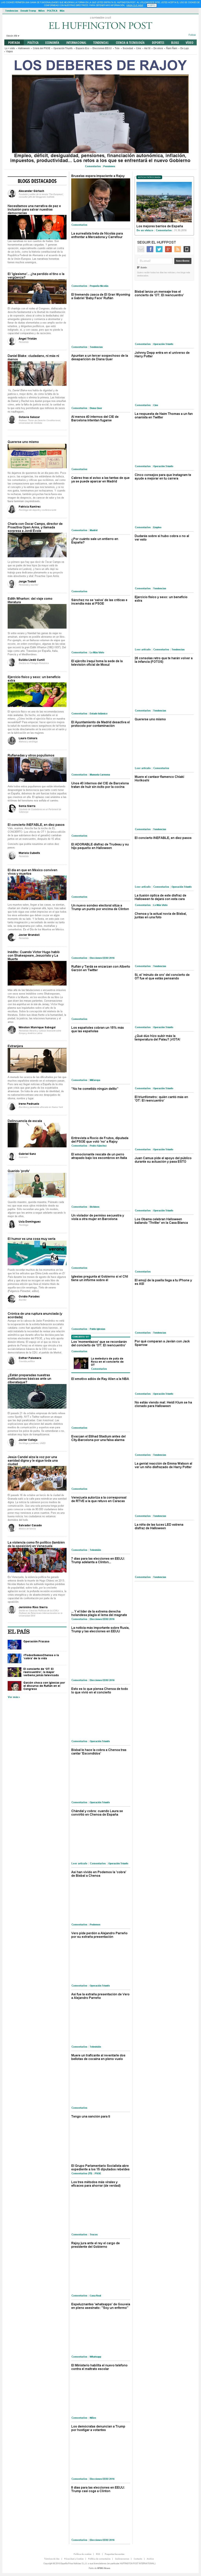 El Huffington Post (Spain) at Wednesday Nov. 2, 2016, 9:06 a.m. UTC